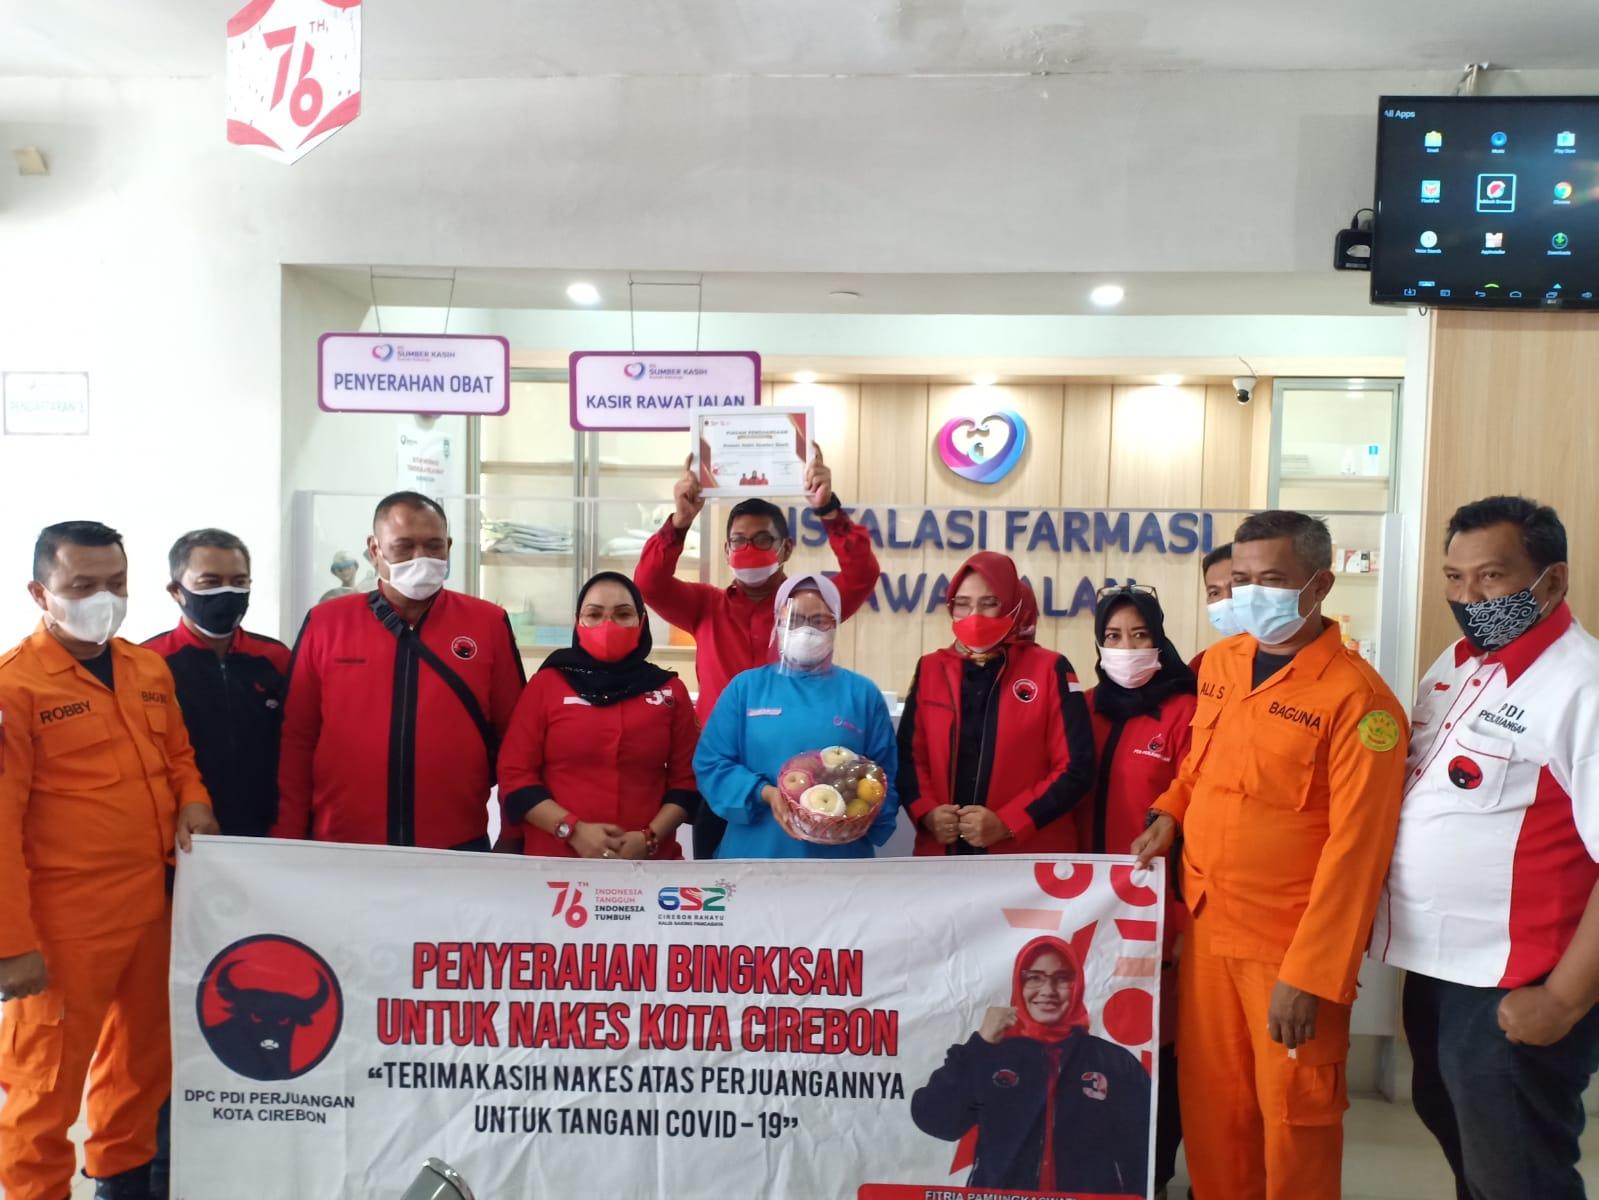 PDI Perjuangan Kota Cirebon Beri Bingkisan ke Nakes di 7 RS dan PMI